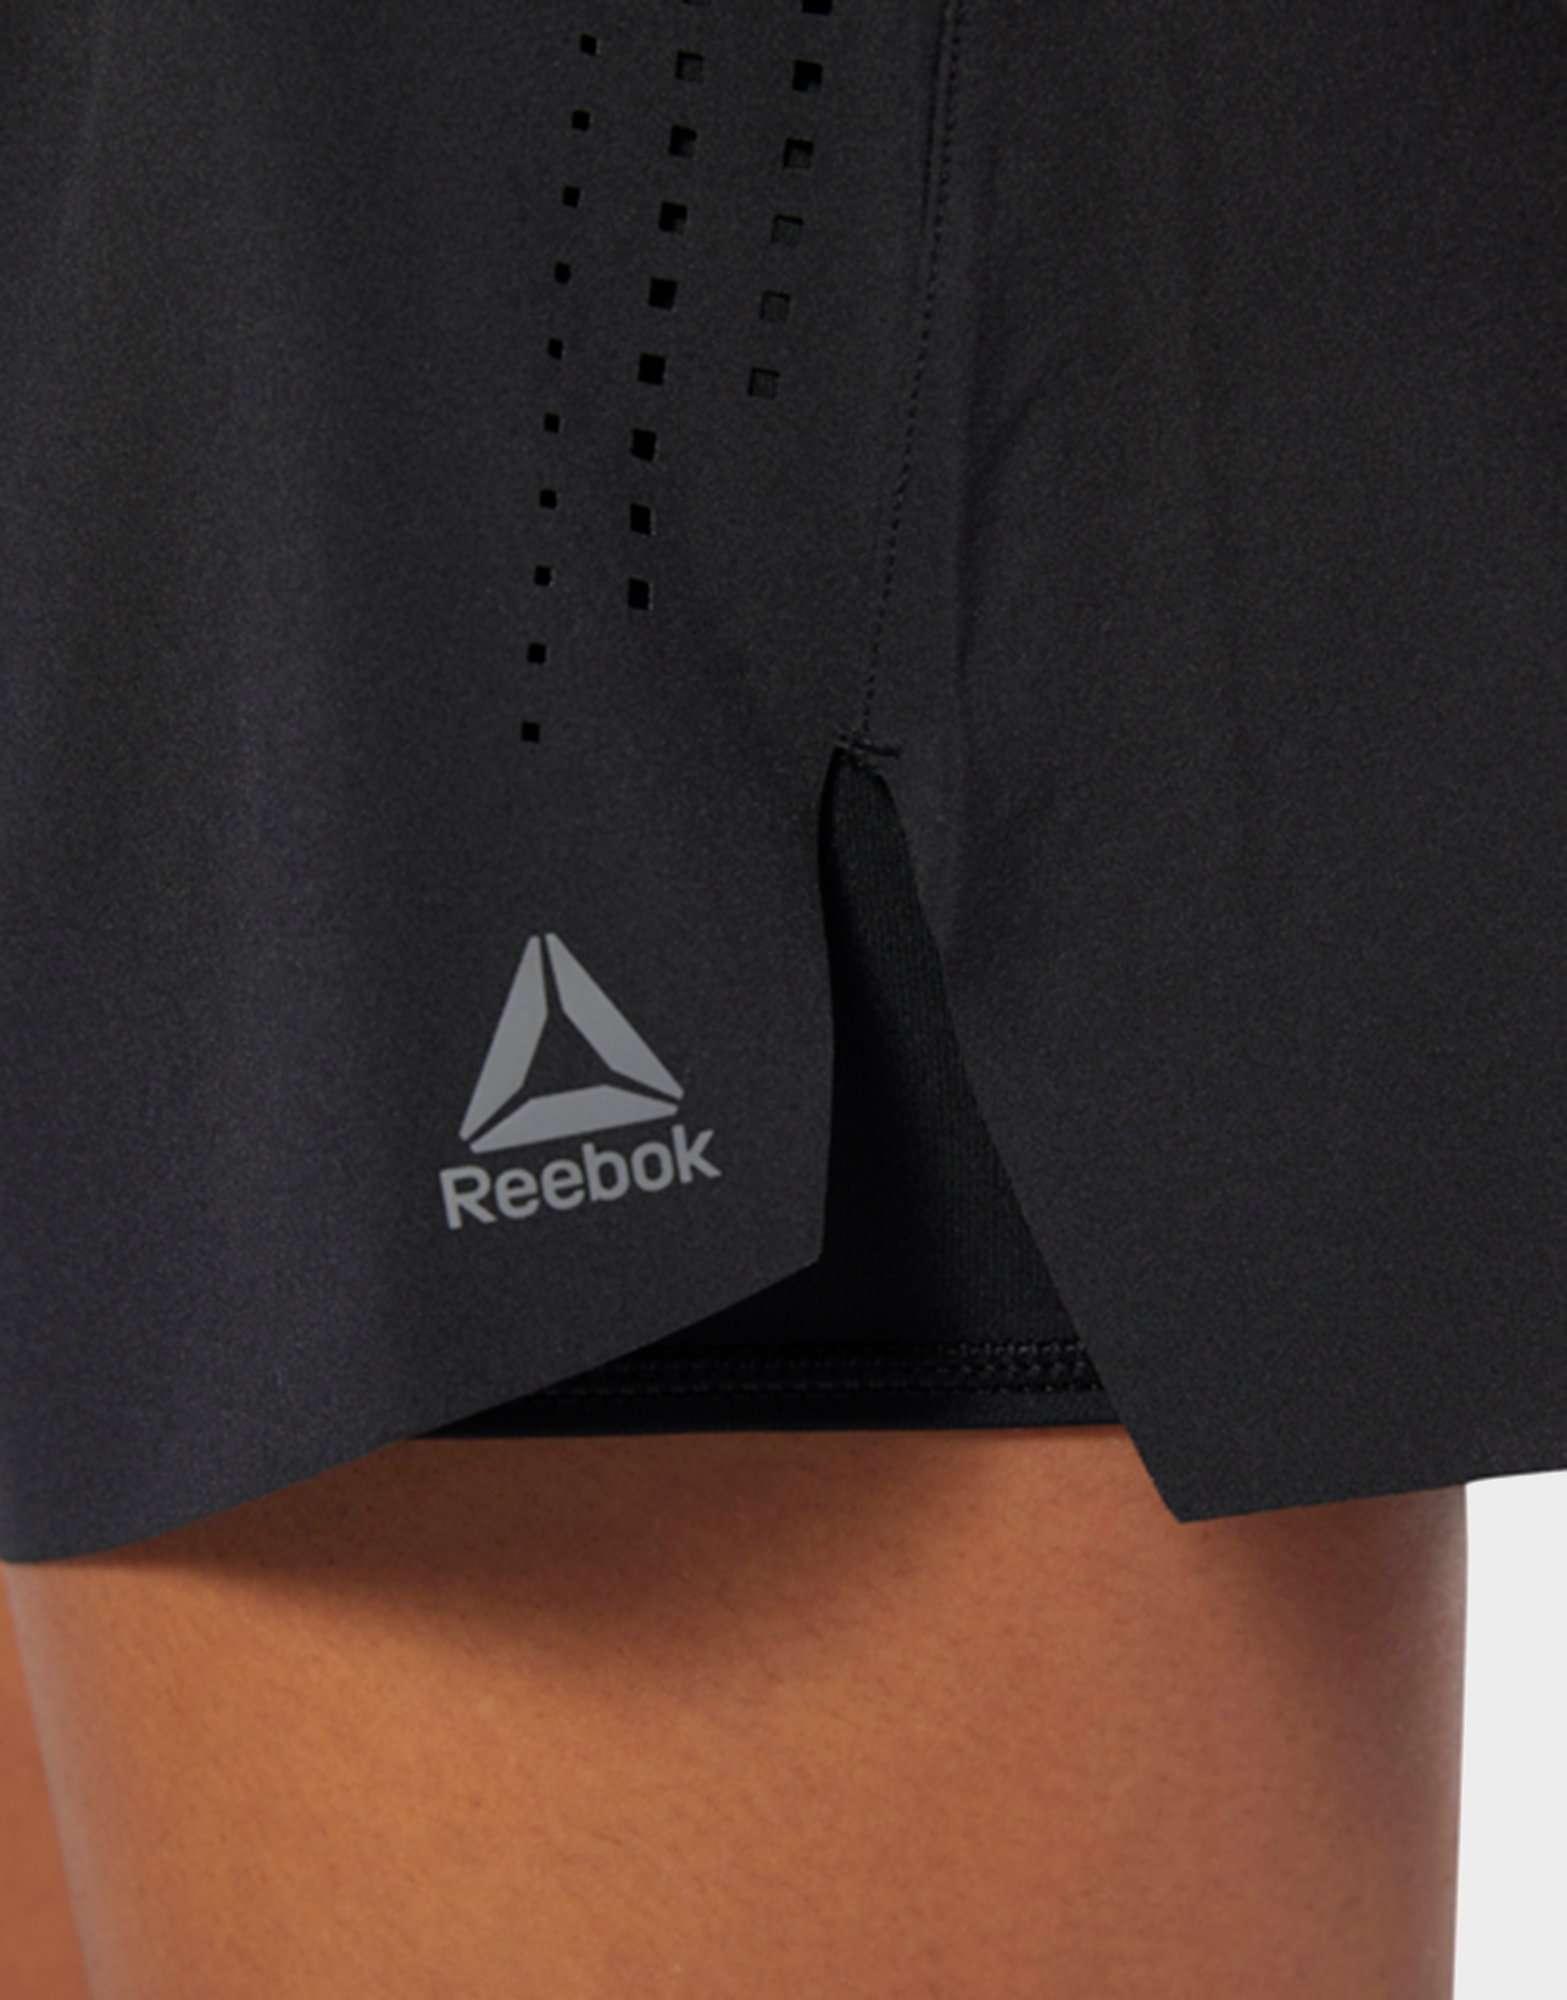 REEBOK Epic Shorts